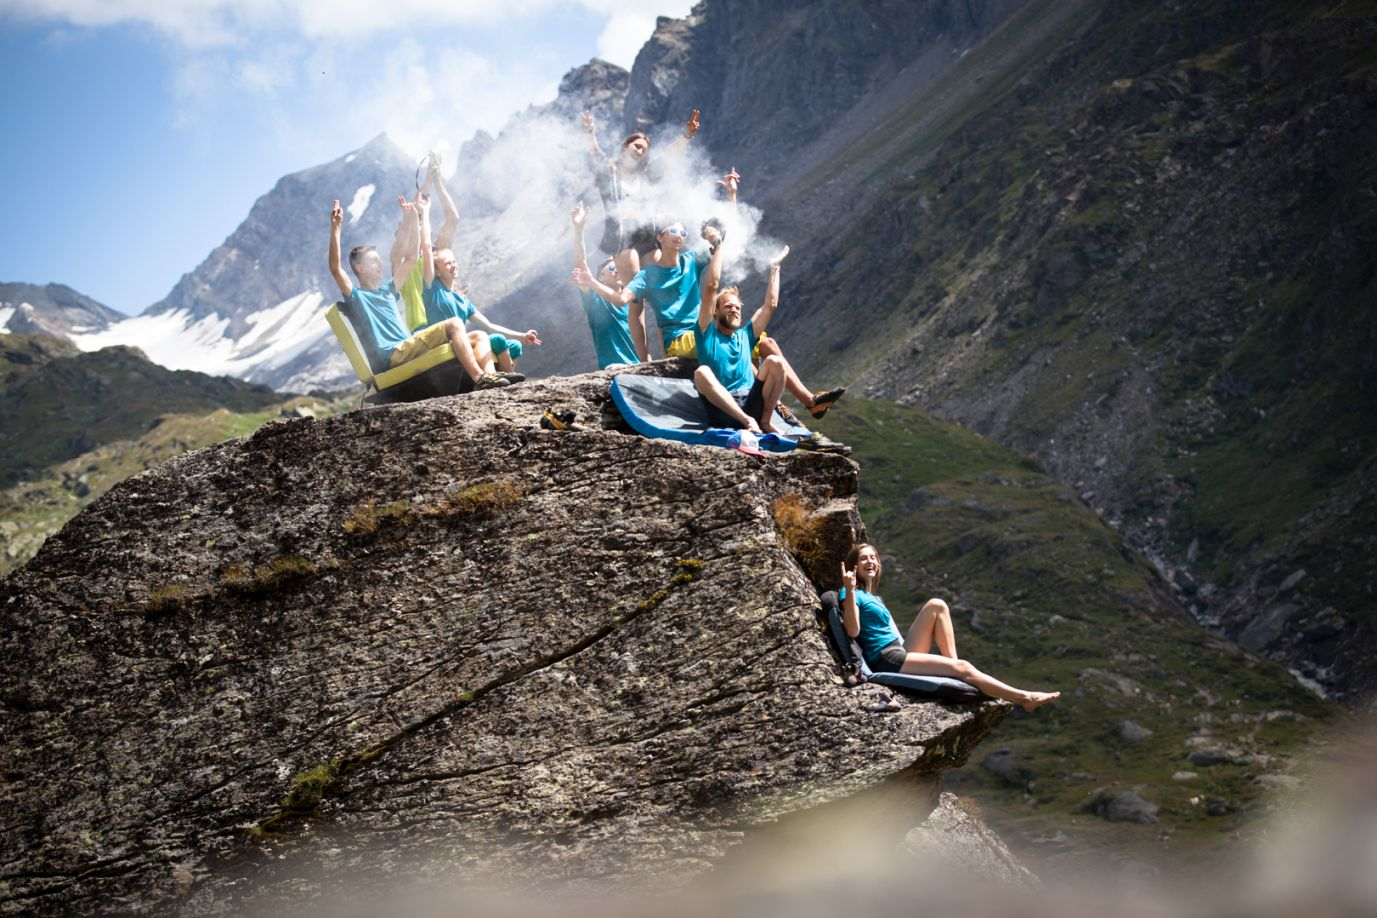 Boulder-Gruppe in Osttirol, Foto: Tobias Attenberger | Climbers Paradise